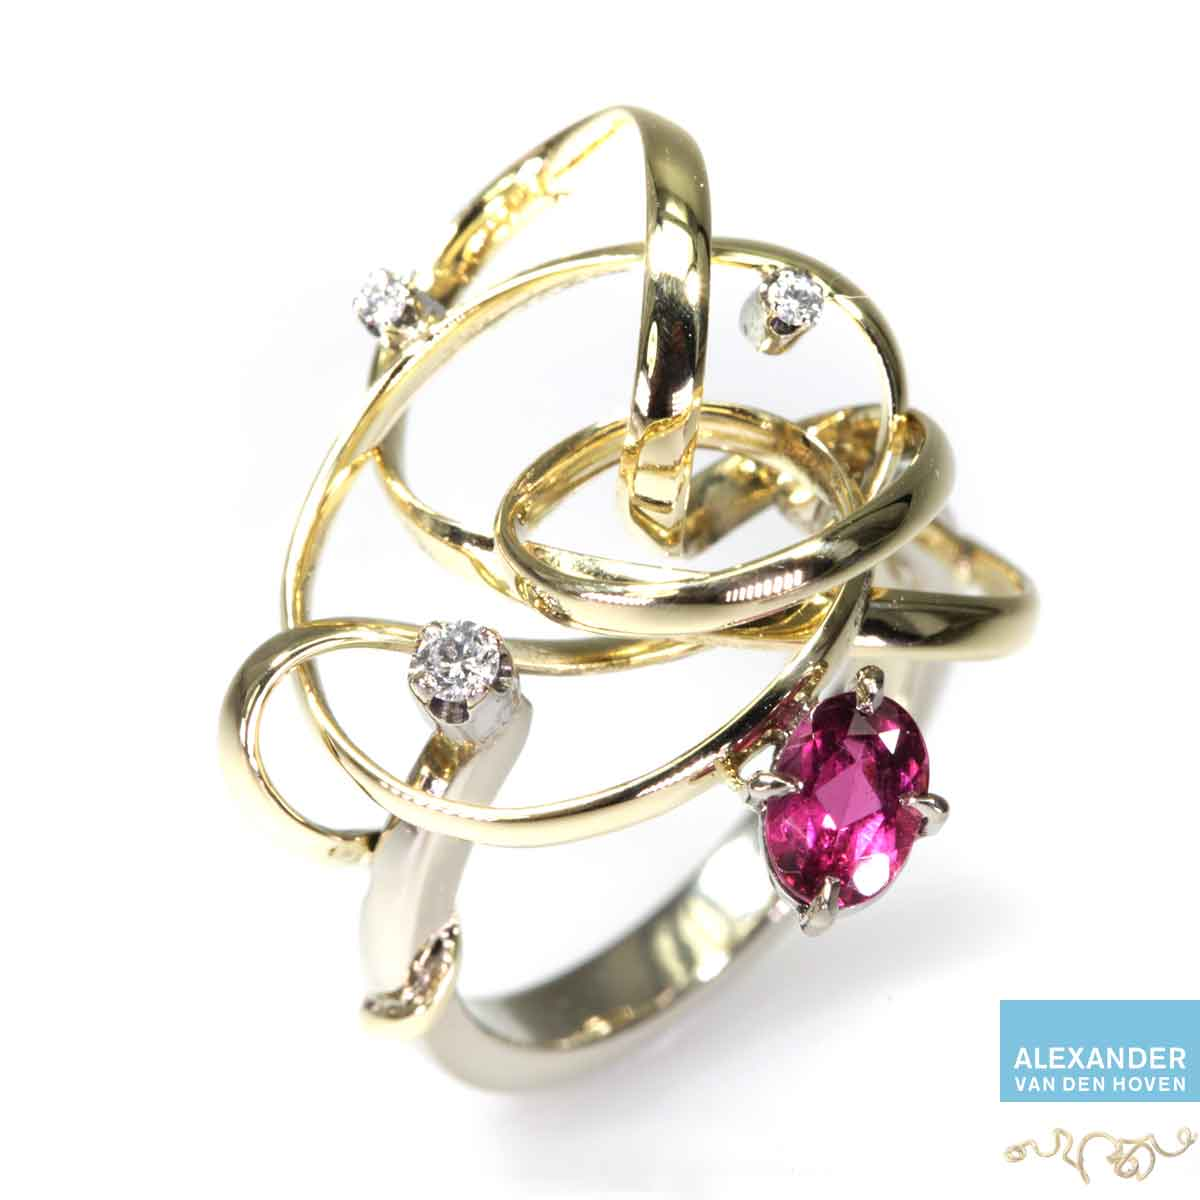 Gouden-krul-ring-Robijn-Diamanten-golvende-gebogen-krullen